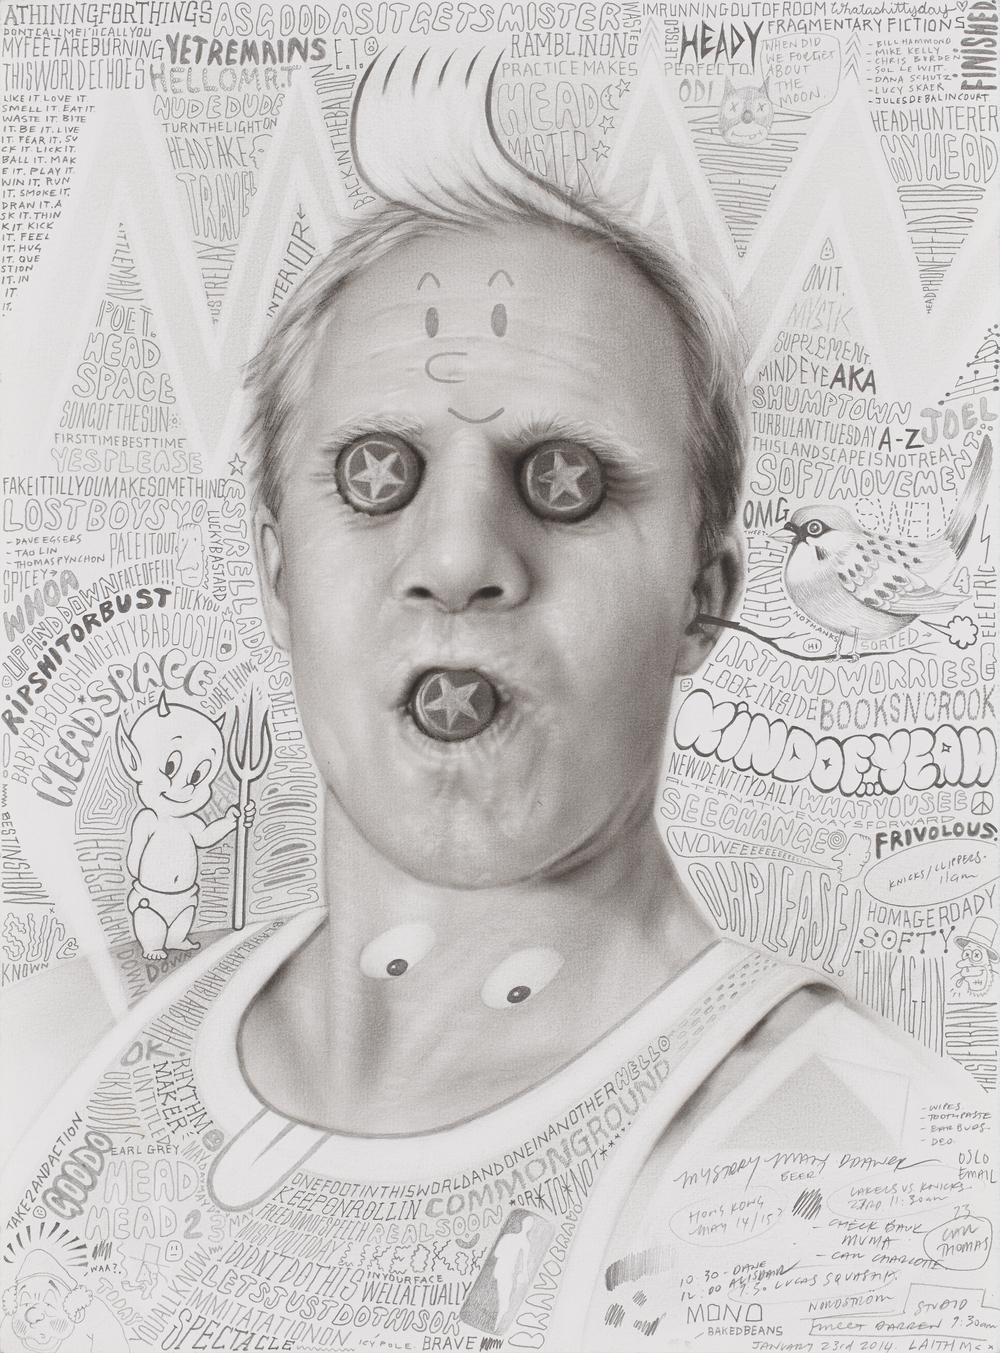 Laith McGregor,  AGAIG , 2014, pencil on paper, 460 x 360 mm